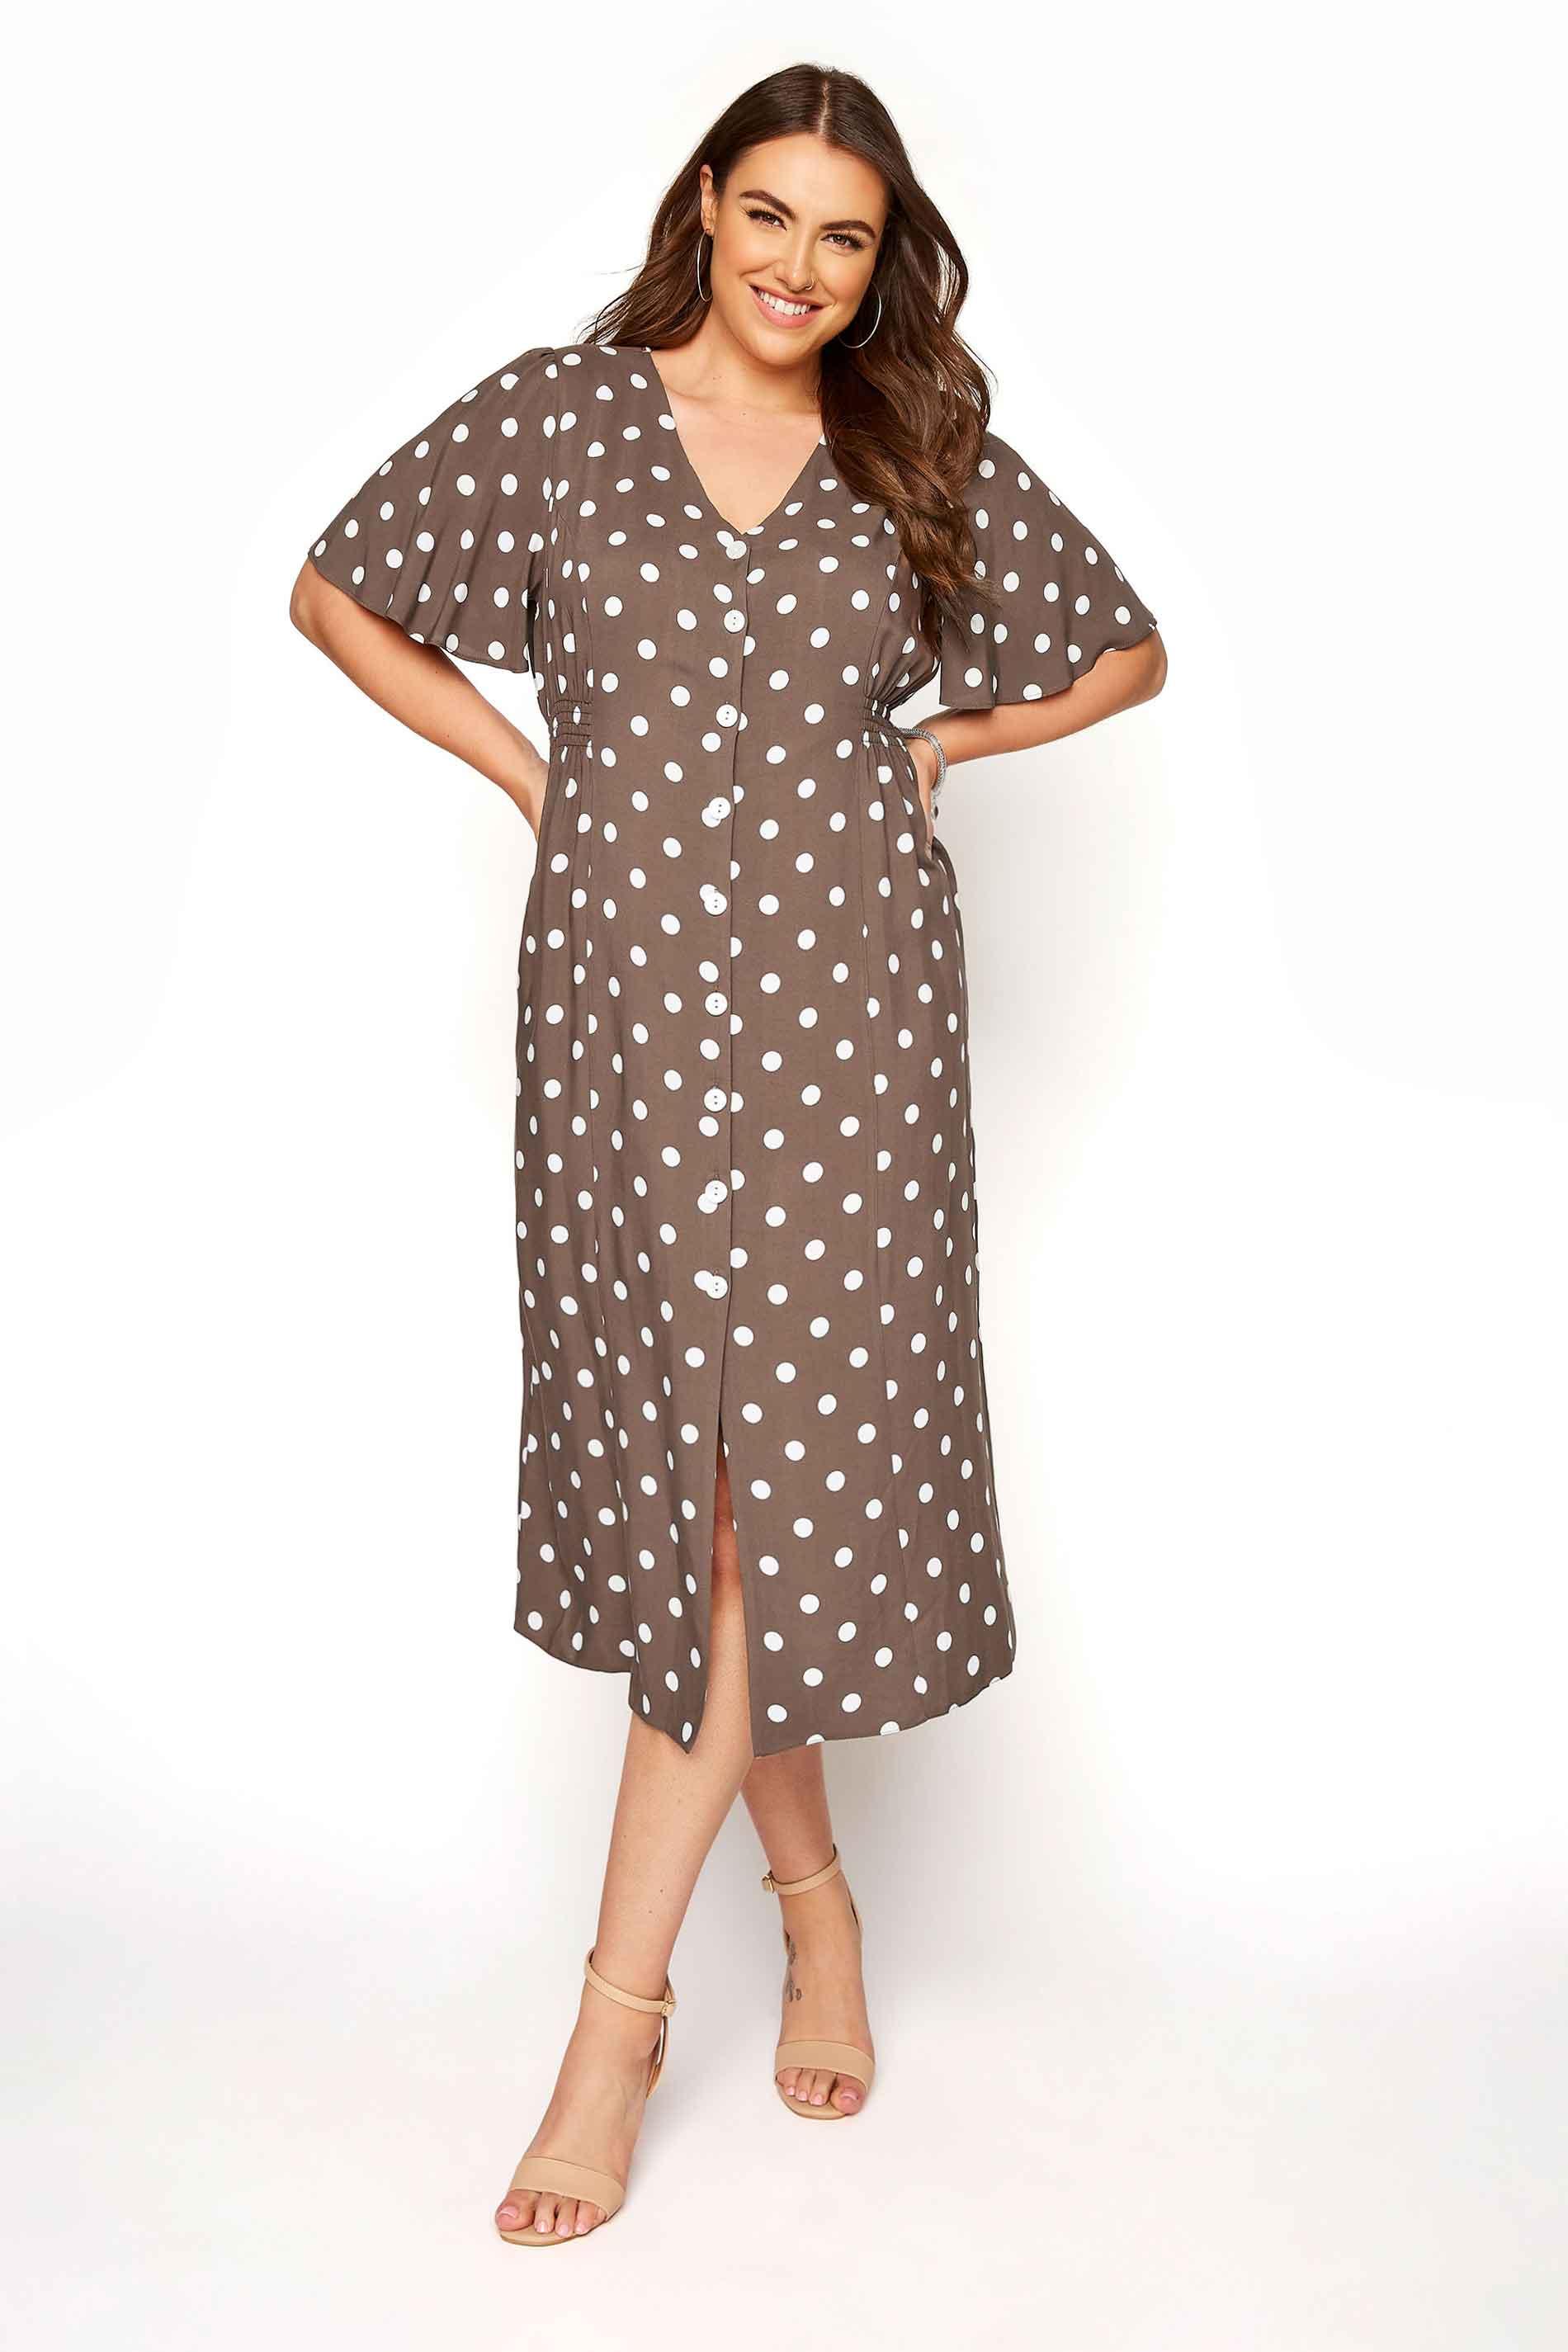 YOURS LONDON Brown Polka Dot Button Through Midi Dress_ebf9.jpg